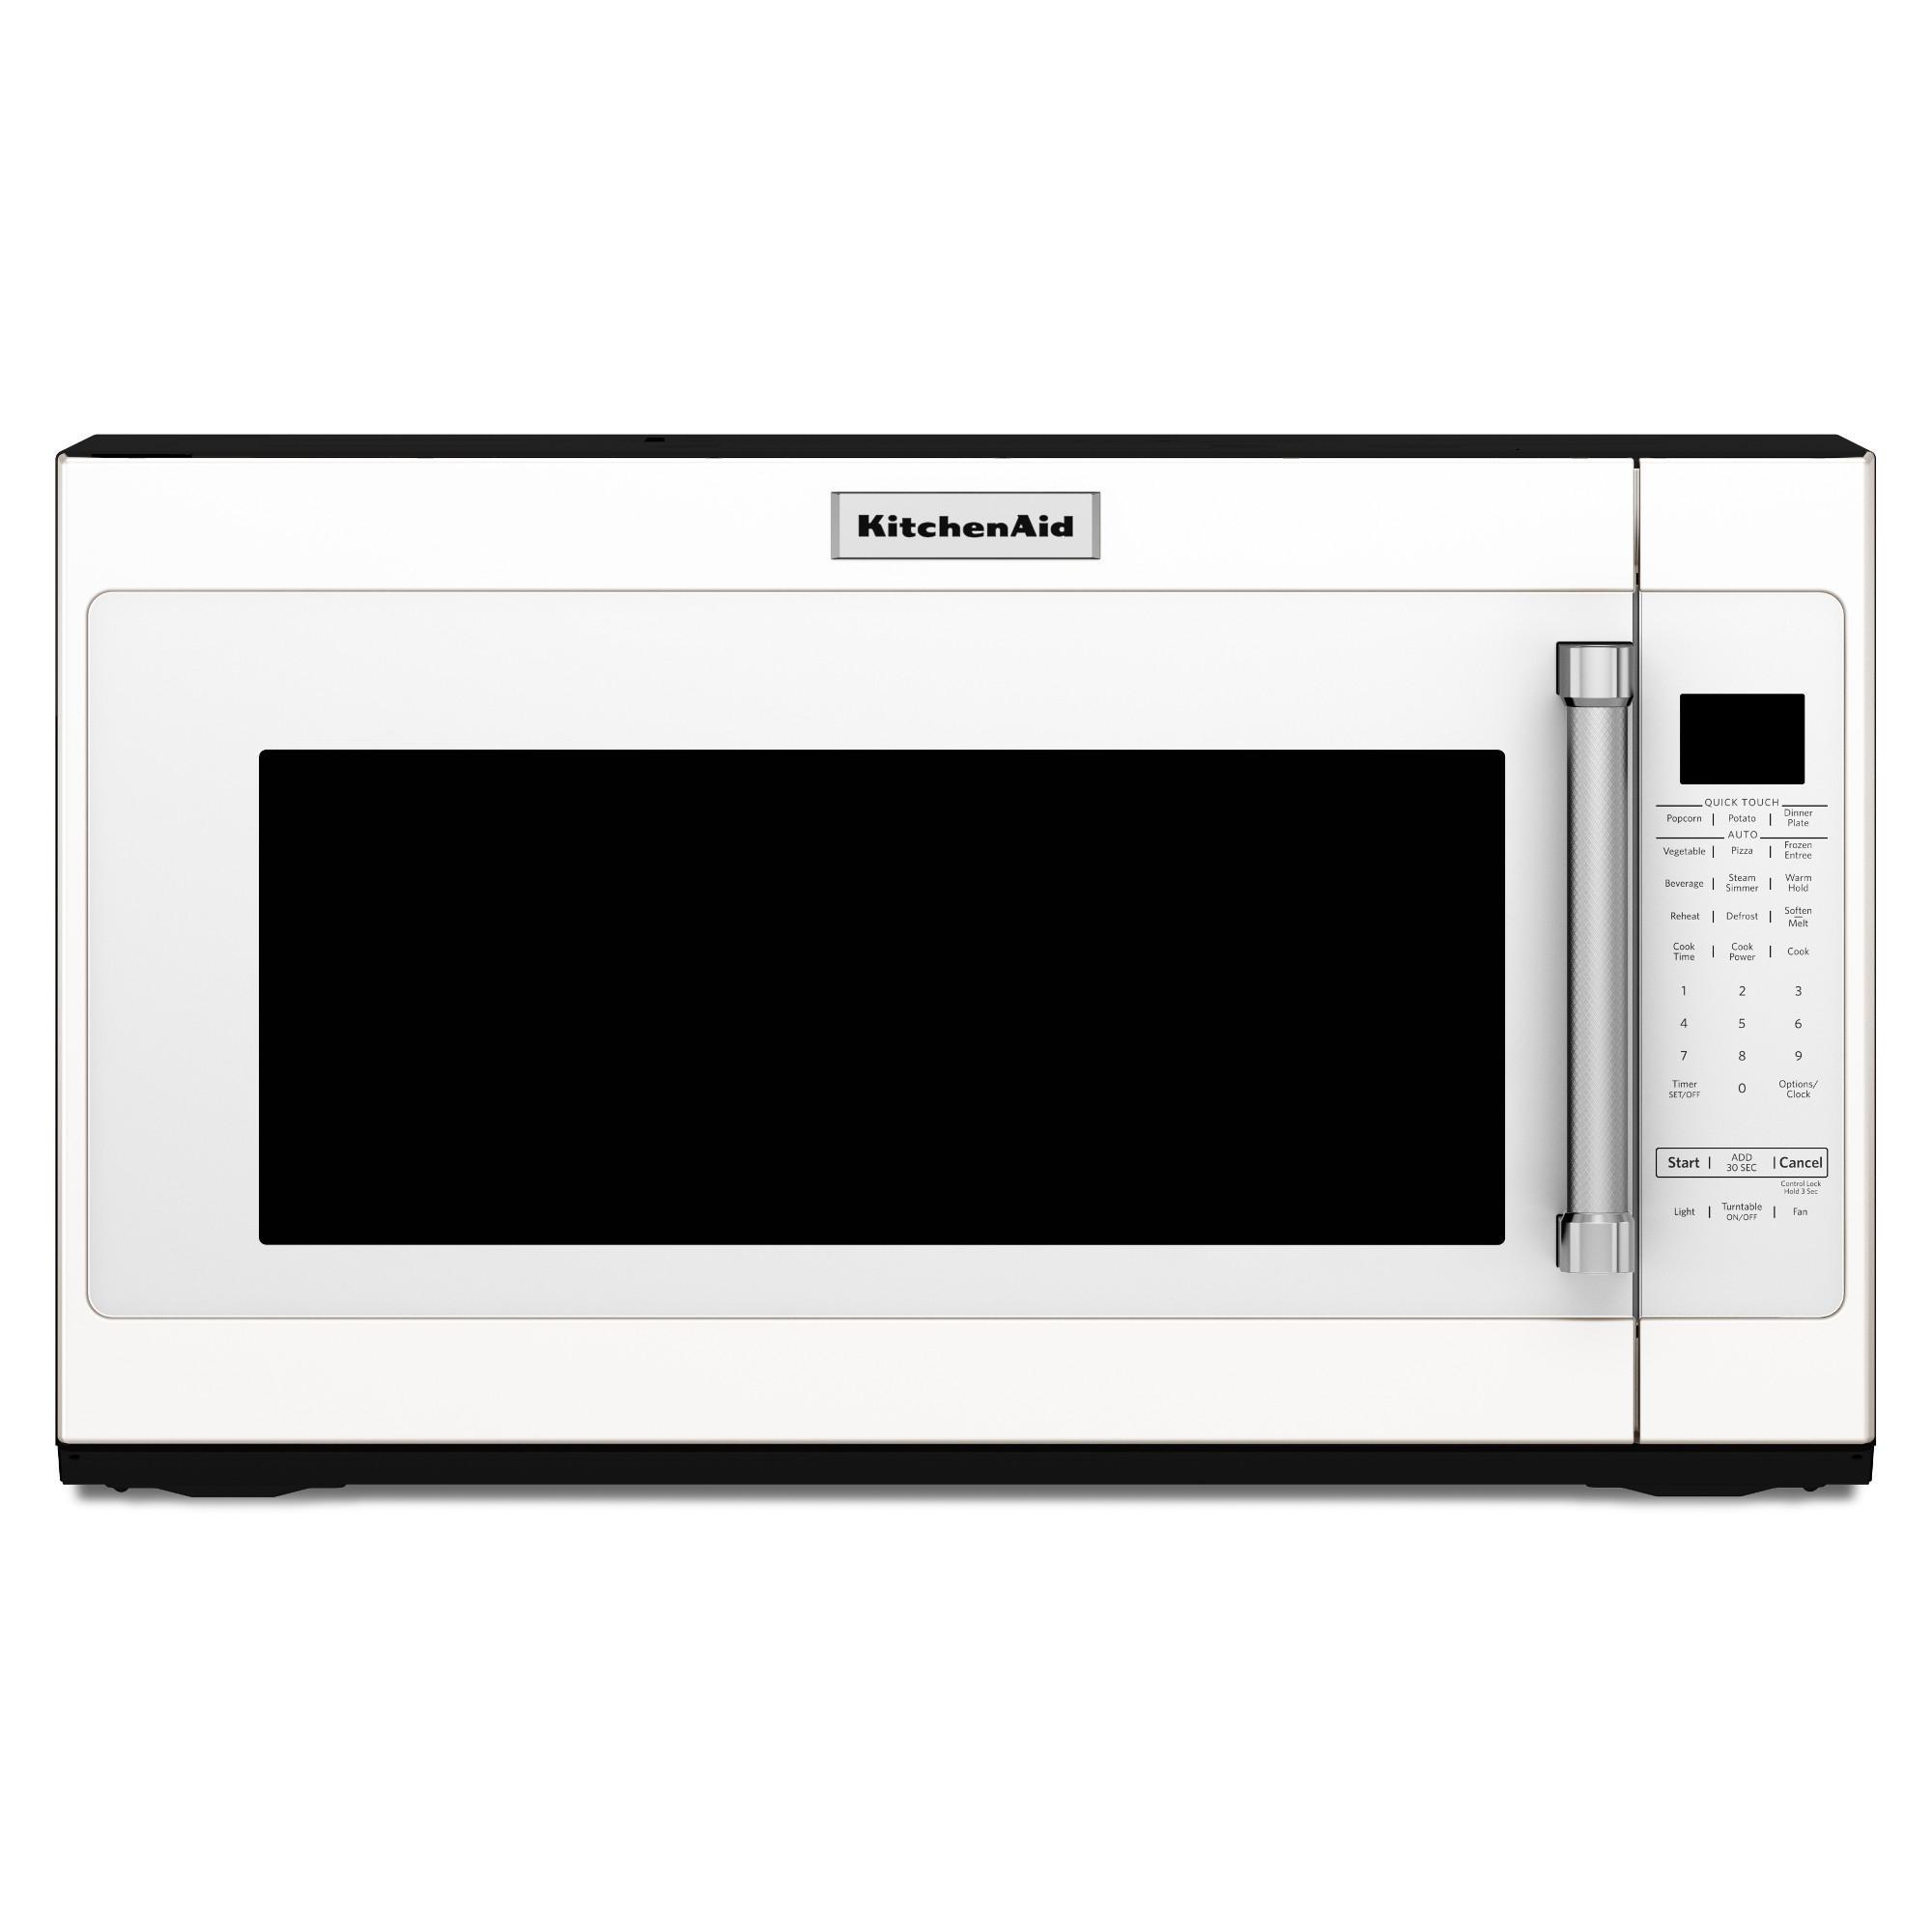 kitchen aid microwaves lighting ideas for kitchenaid kmhs120ewh 2 cu ft 1000 watt microwave